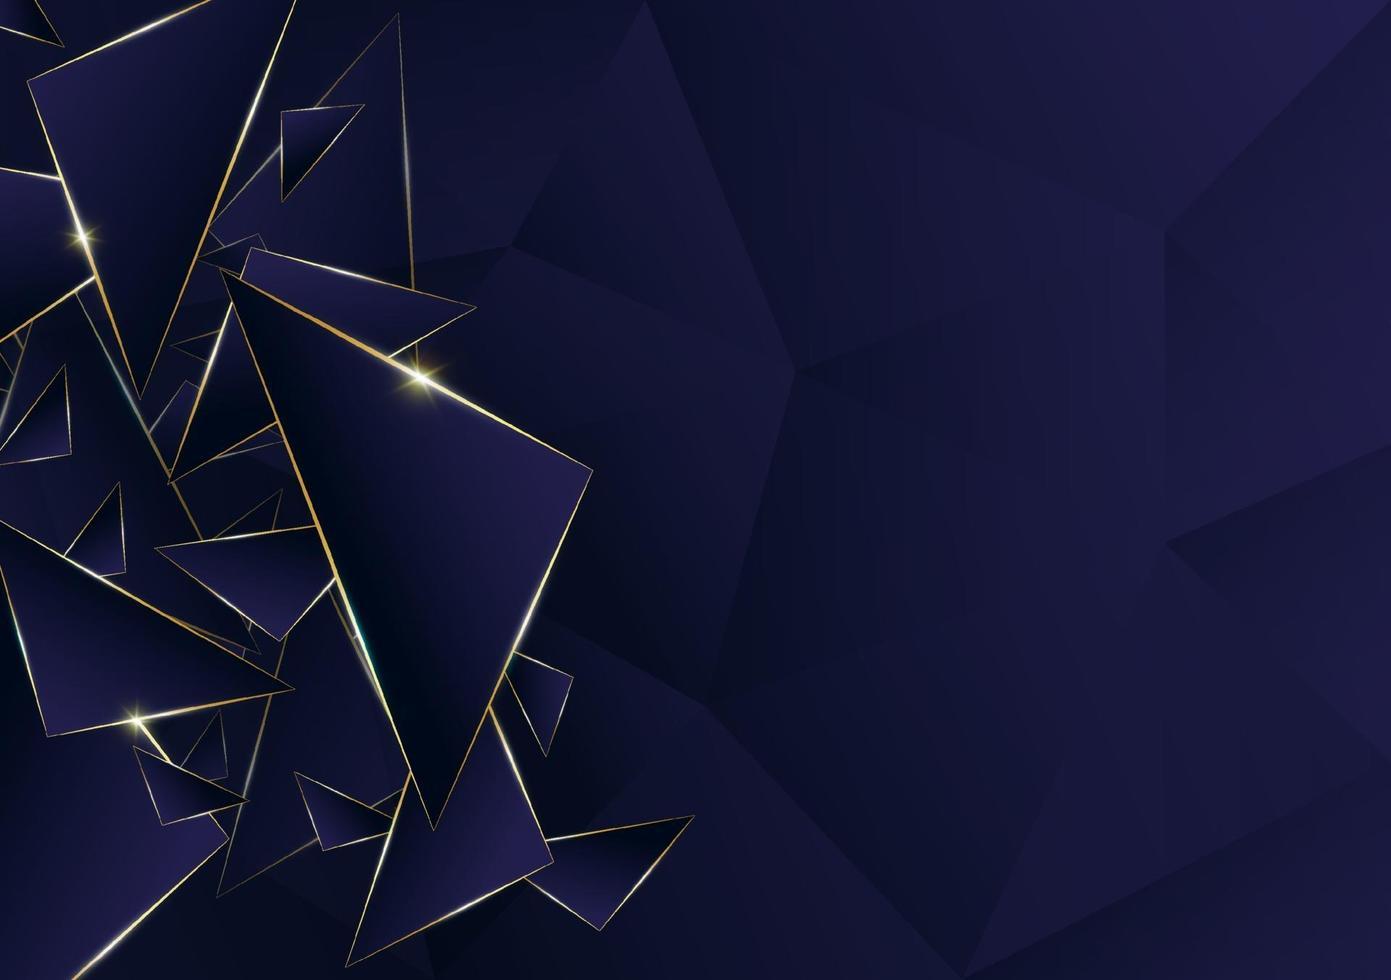 Línea dorada de lujo de patrón poligonal abstracto con fondo de plantilla azul oscuro. estilo premium para póster, portada, impresión, obra de arte. ilustración vectorial vector